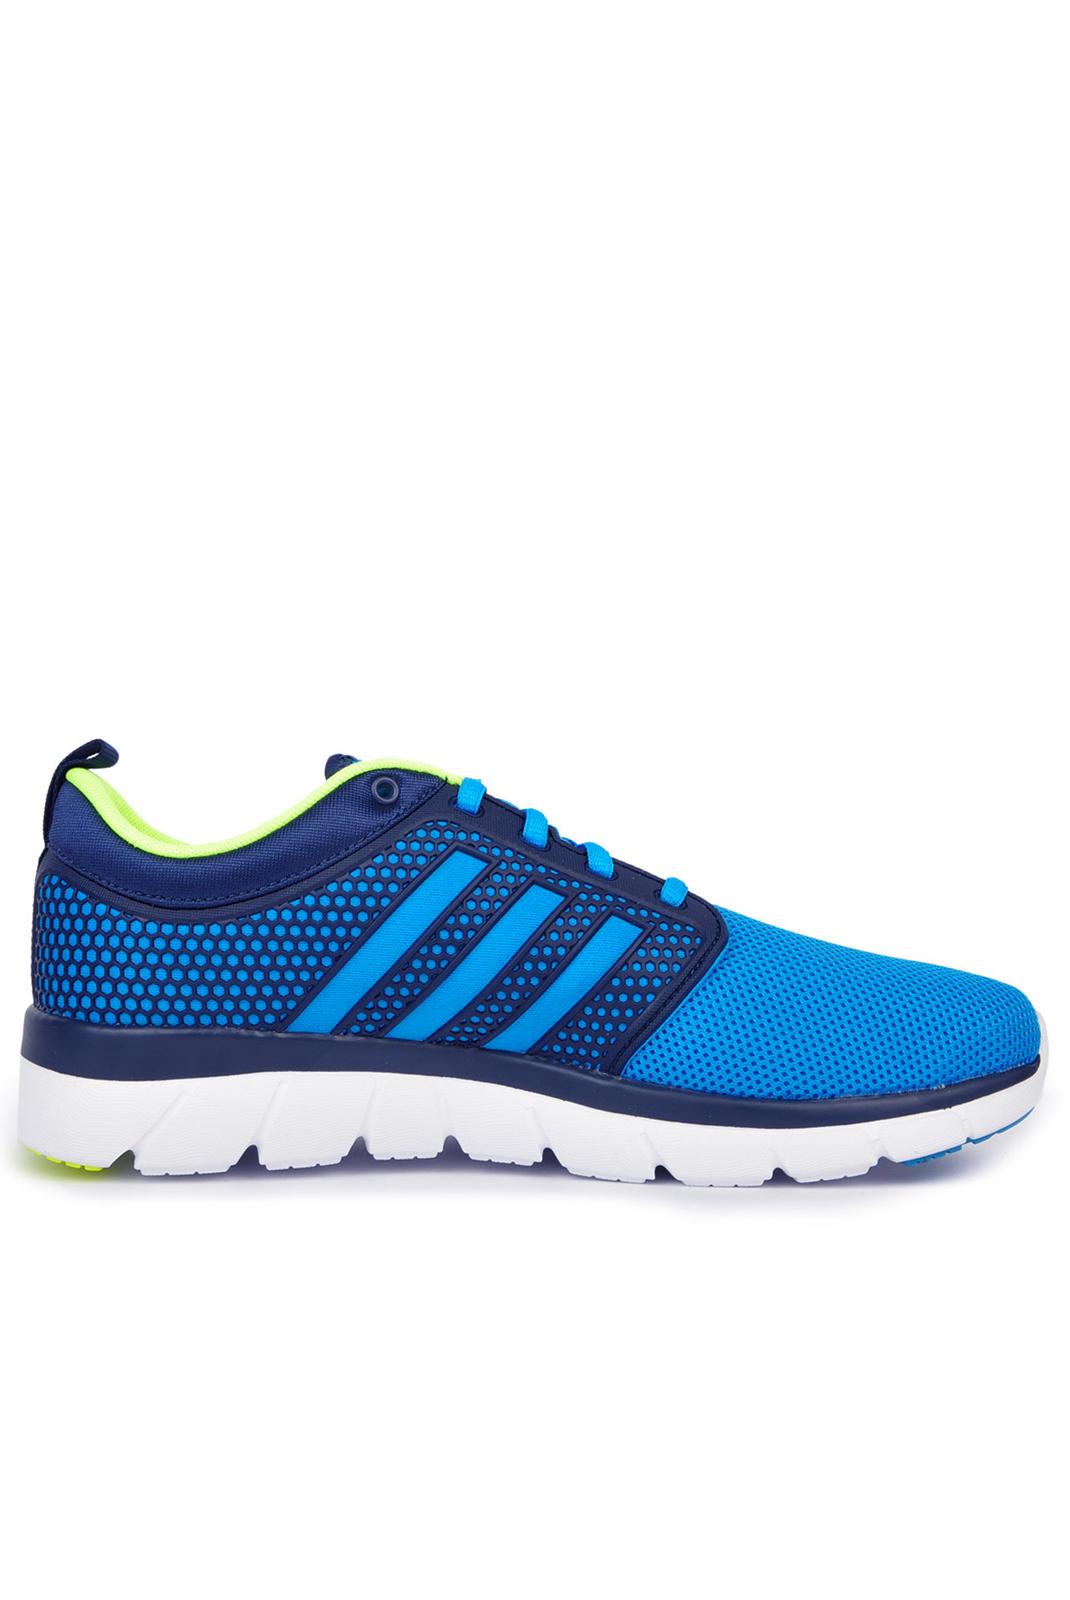 Baskets / Sport  Adidas AQ1427 CLOUDFOAM GROOVE BLUE